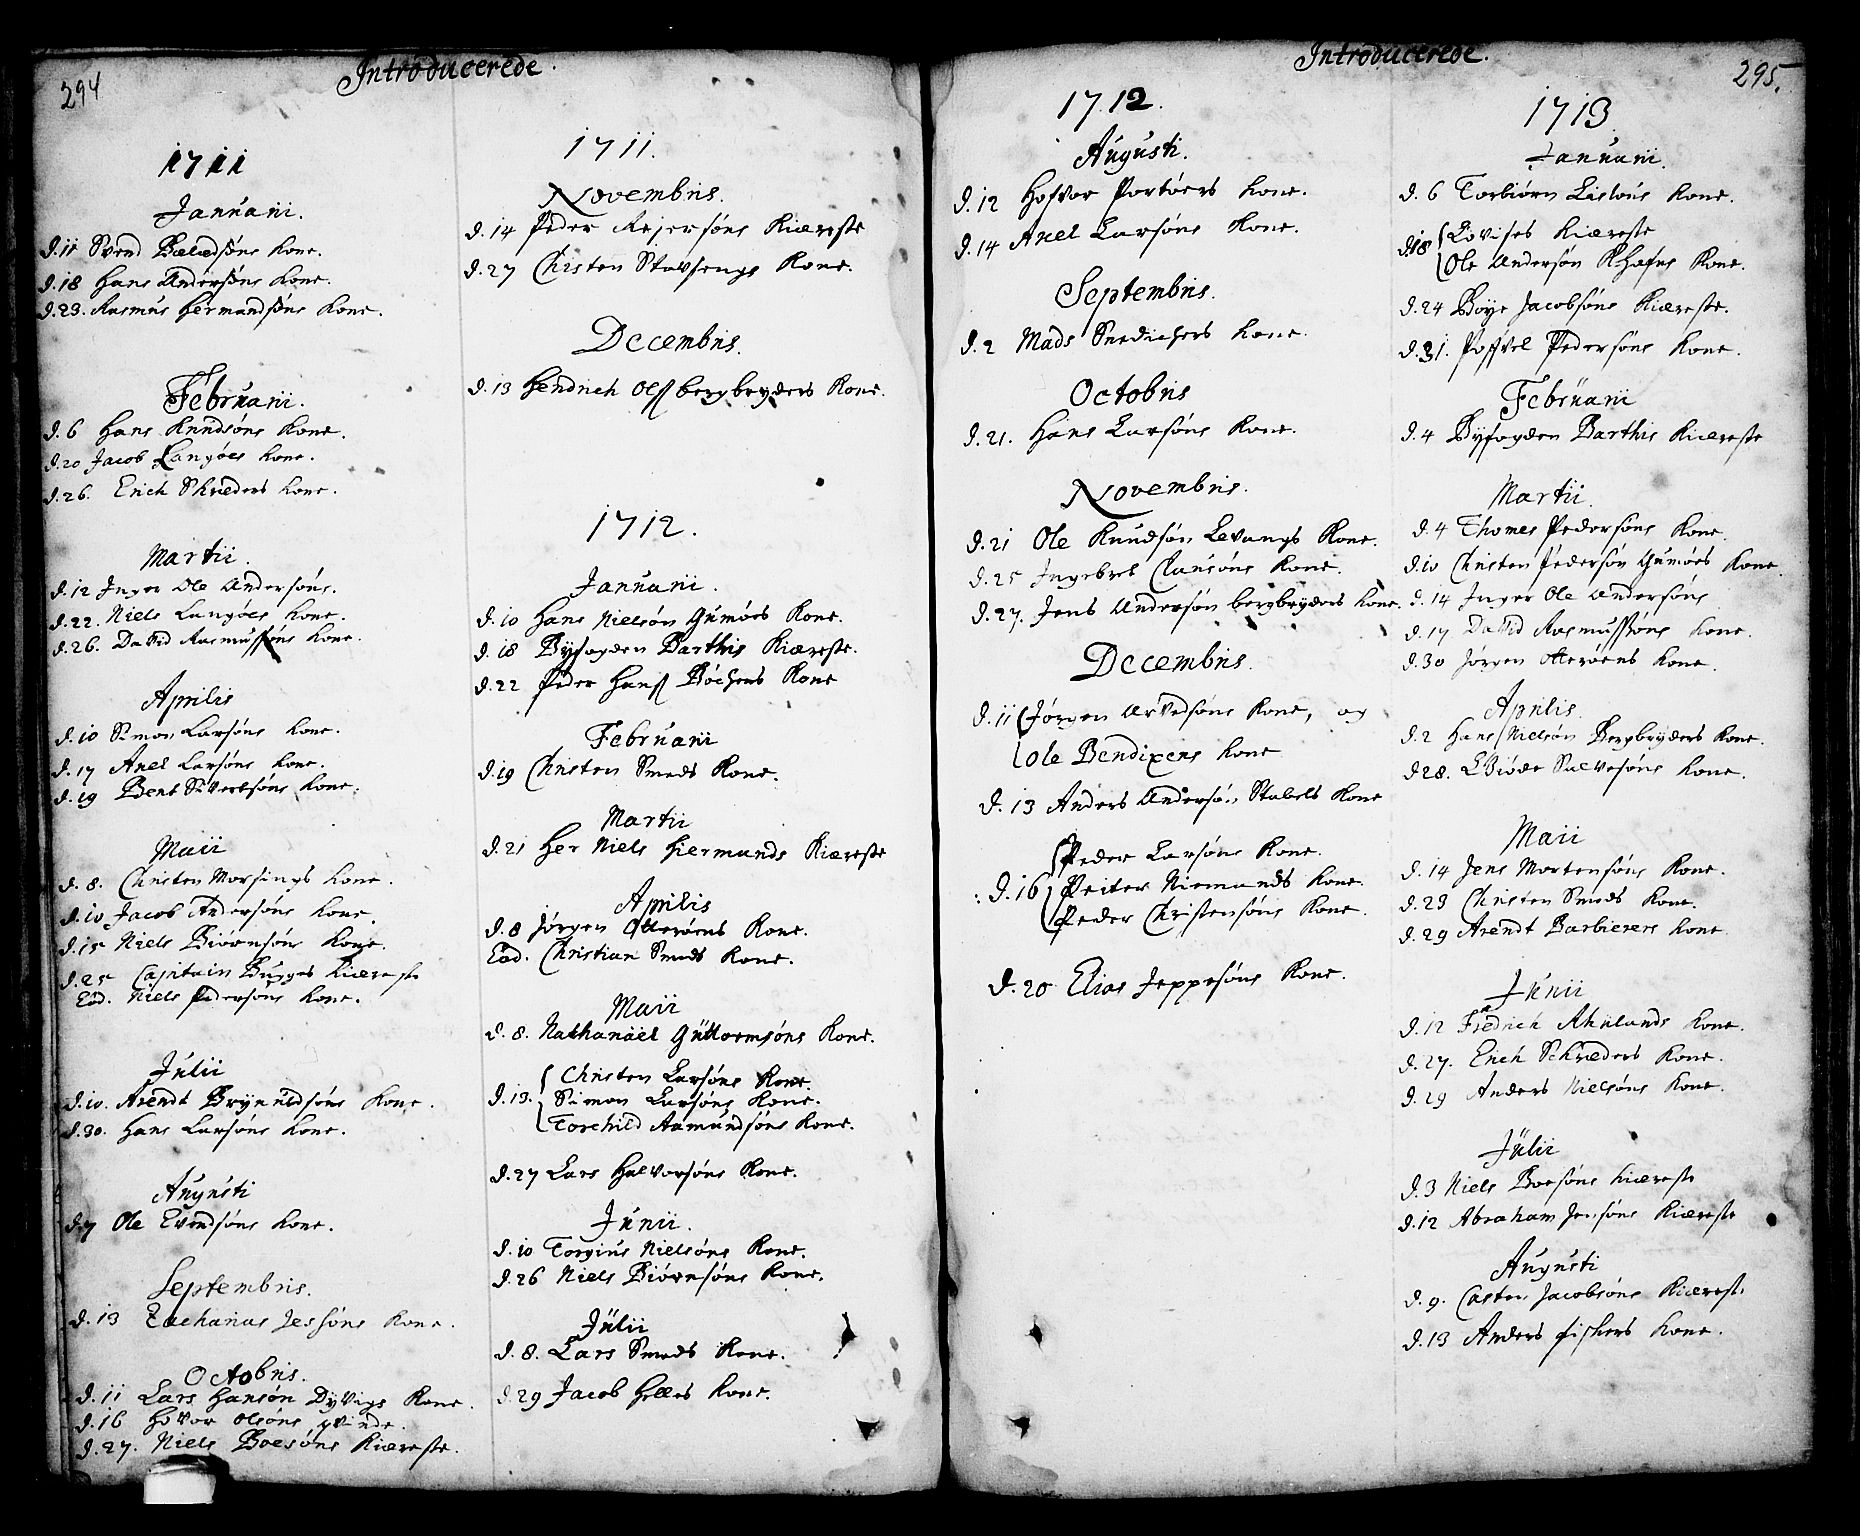 SAKO, Kragerø kirkebøker, F/Fa/L0001: Ministerialbok nr. 1, 1702-1766, s. 294-295